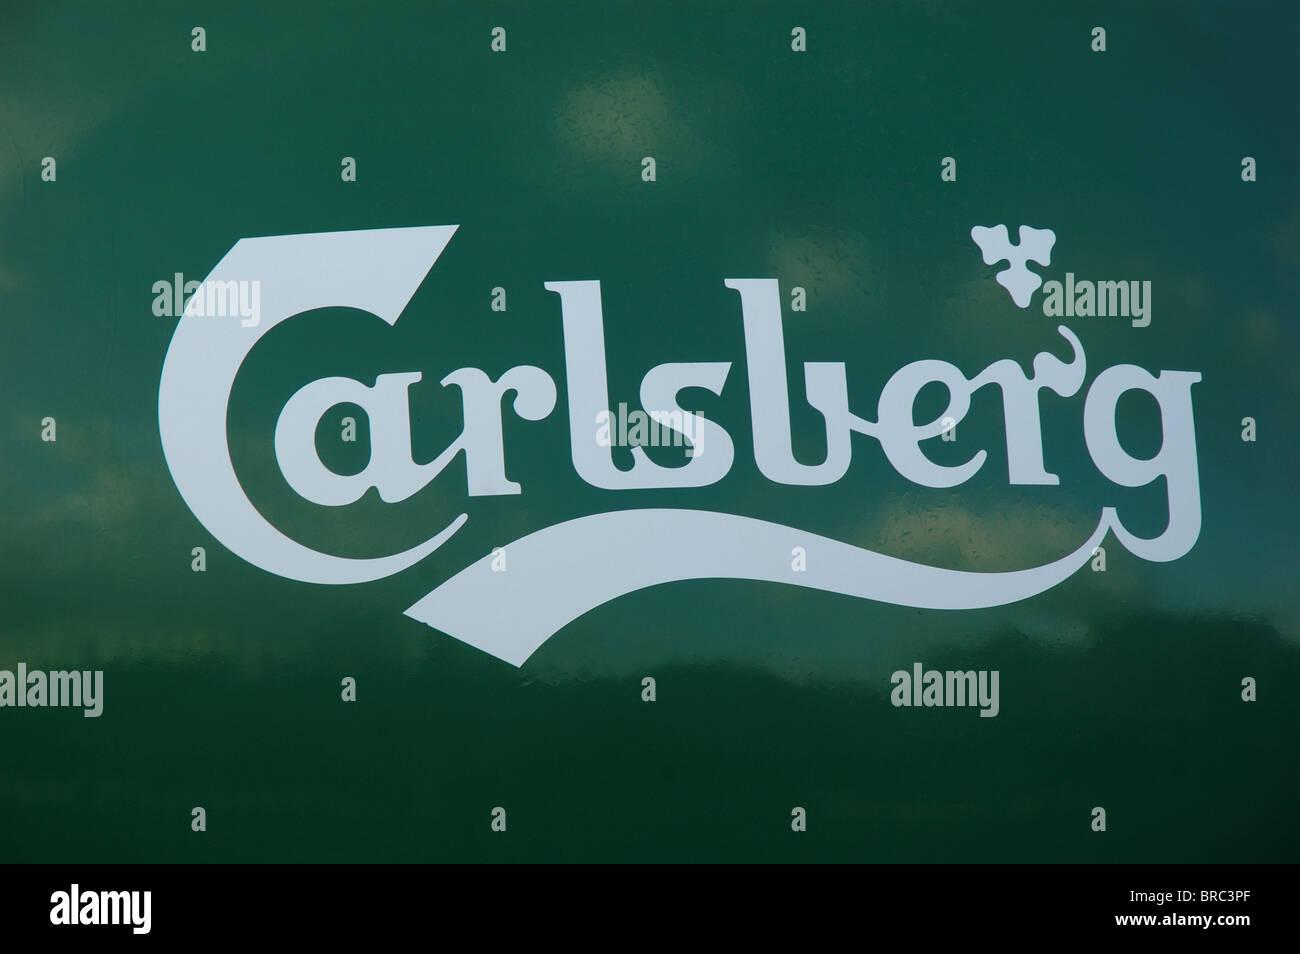 Carlsberg logo on the back of a tanker, Northampton, England, UK - Stock Image